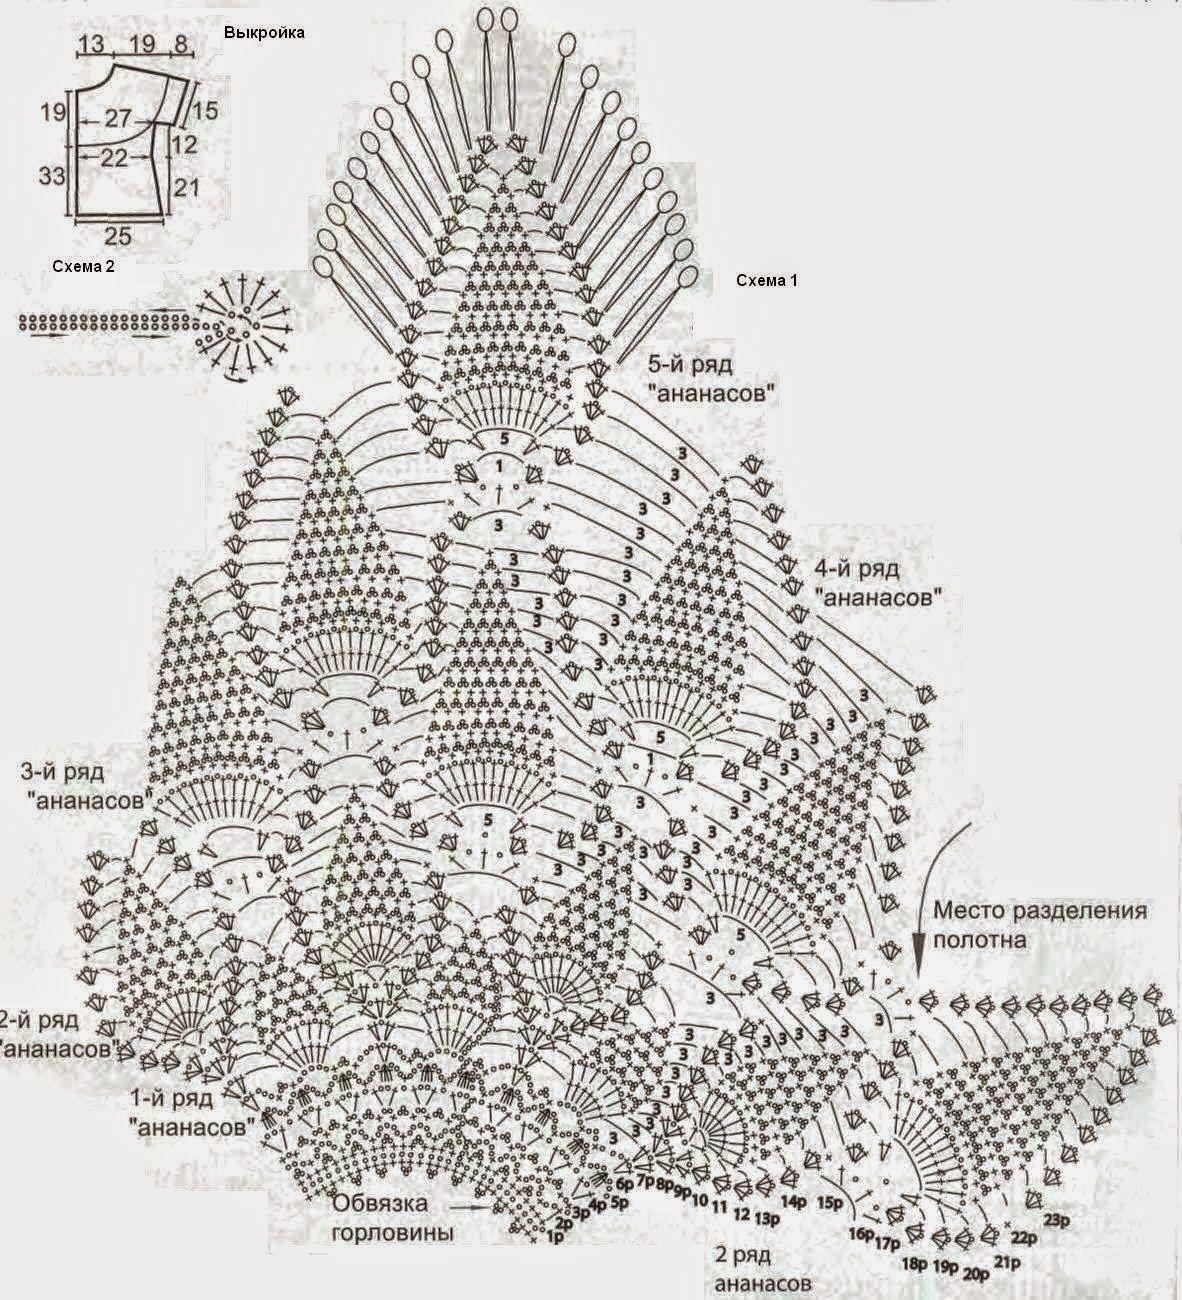 patrones crochet gratis para imprimir - Google Search | Ananasų ...